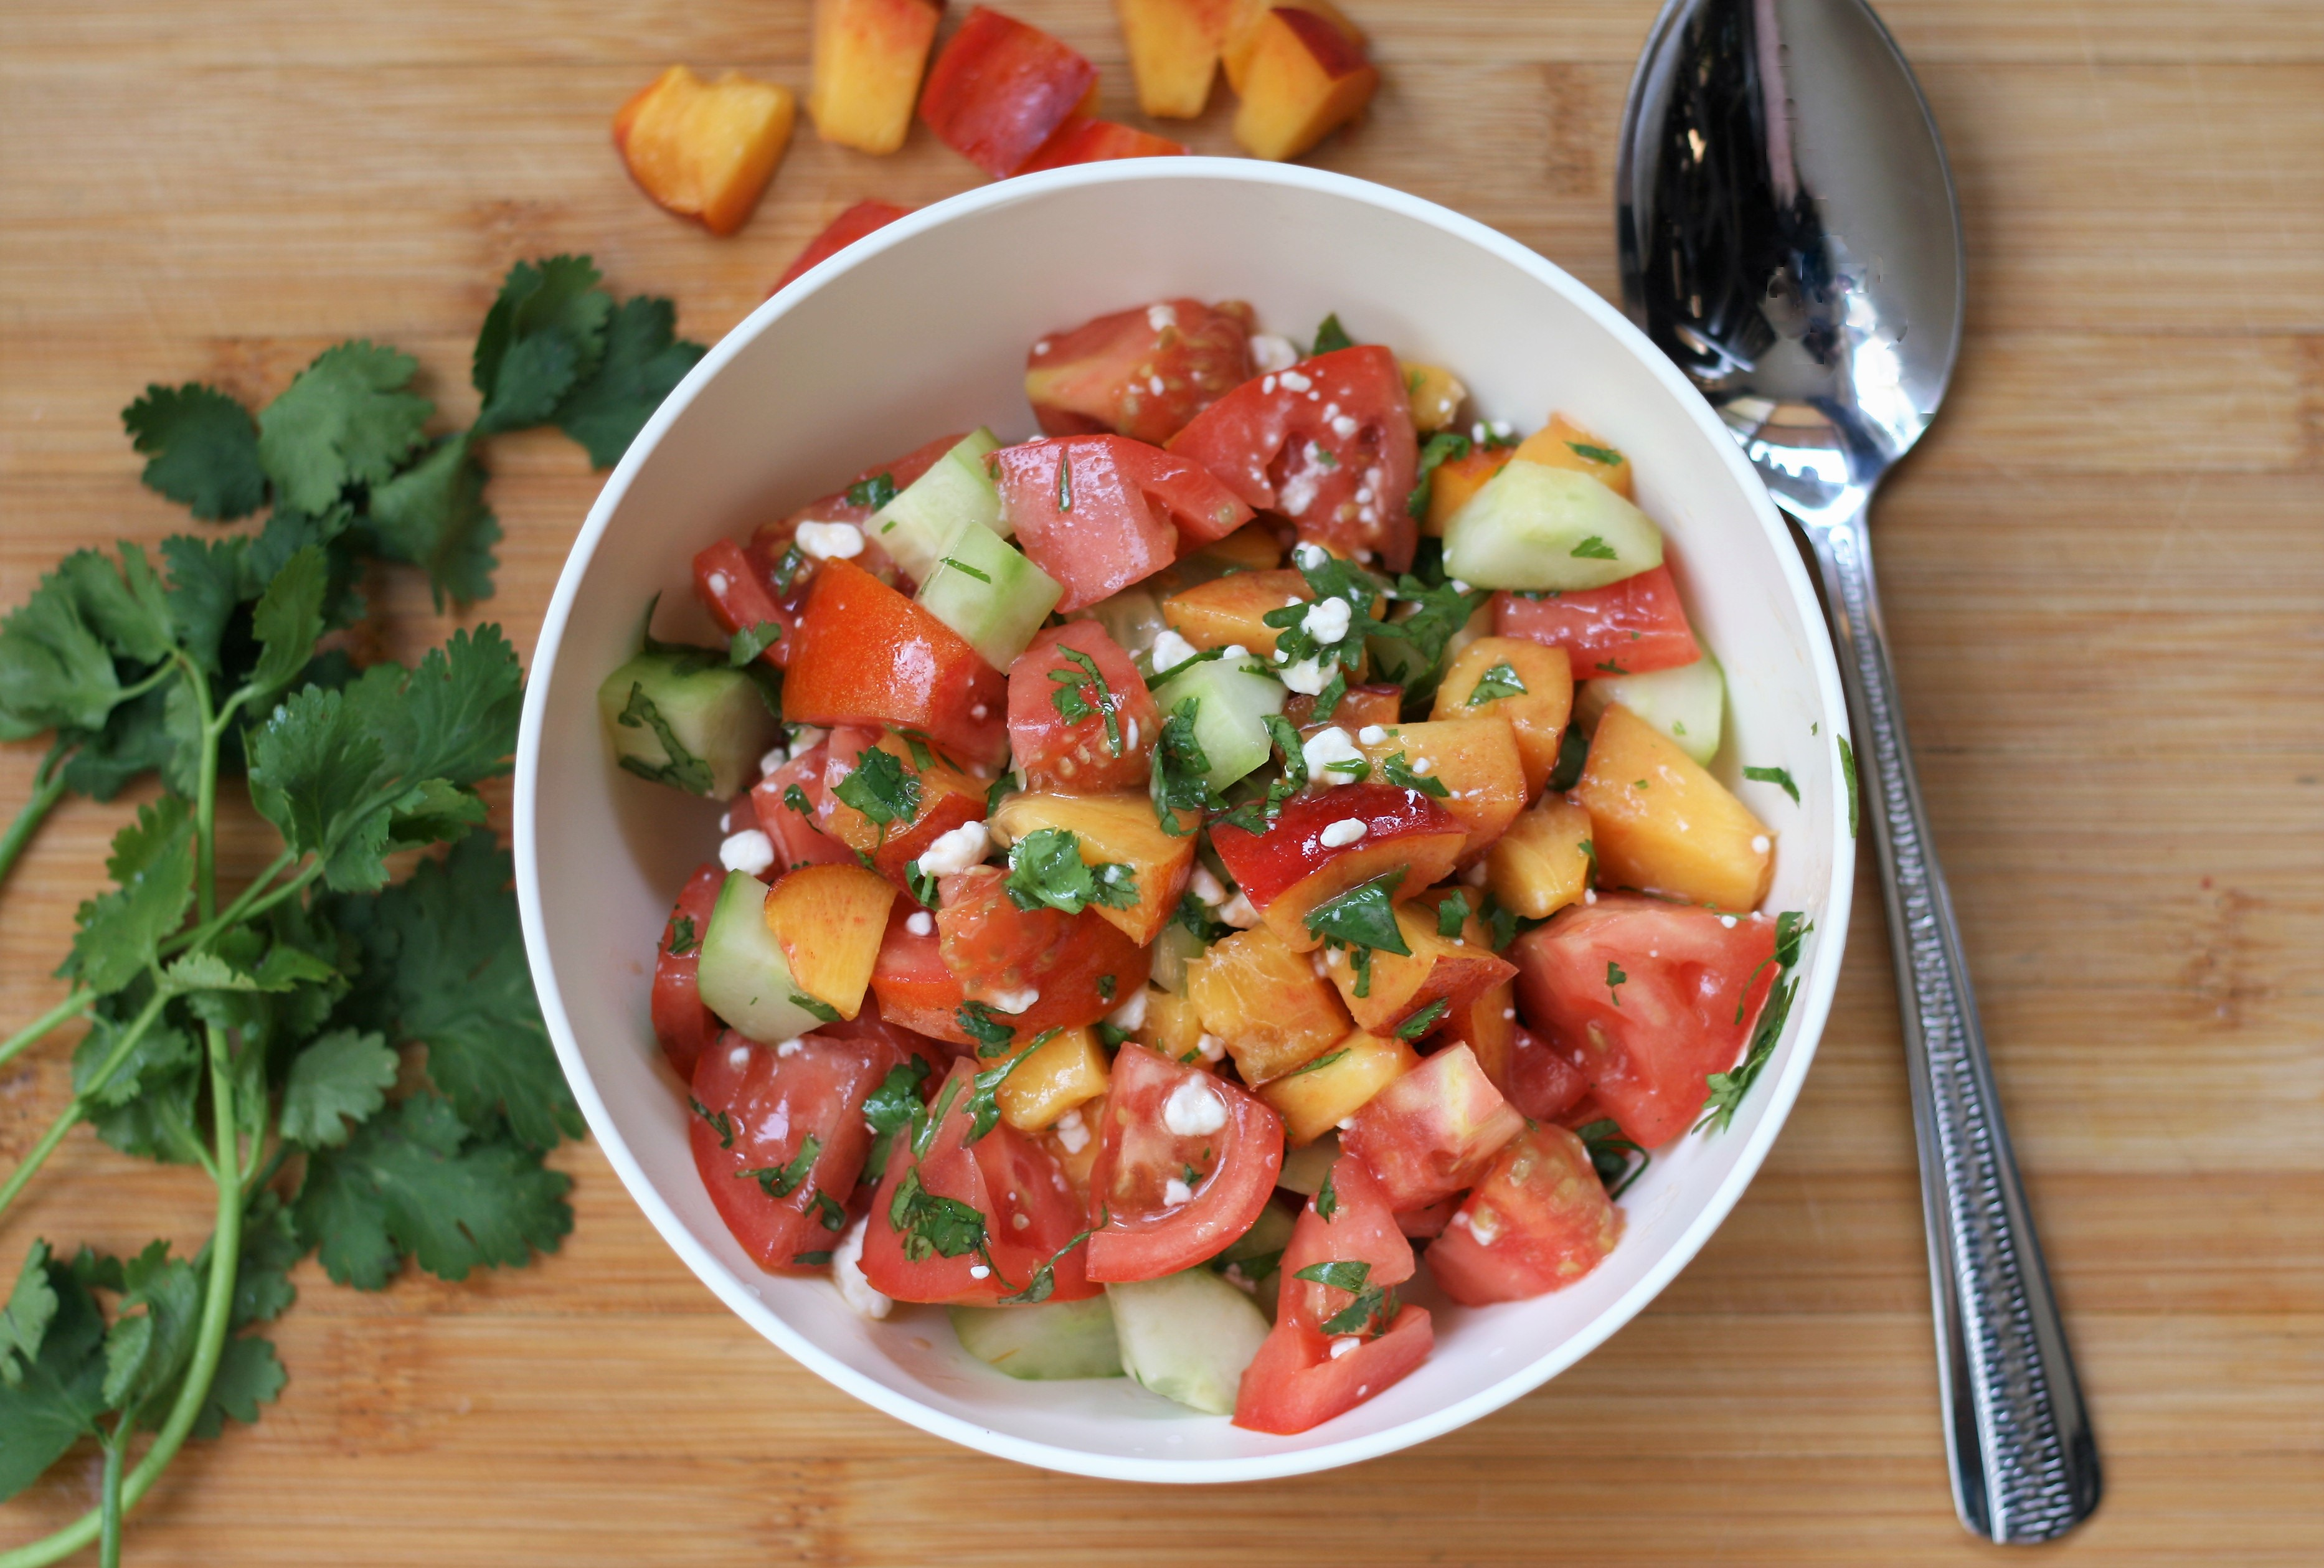 Summer Nectarine, Tomato, and Cucumber Salad